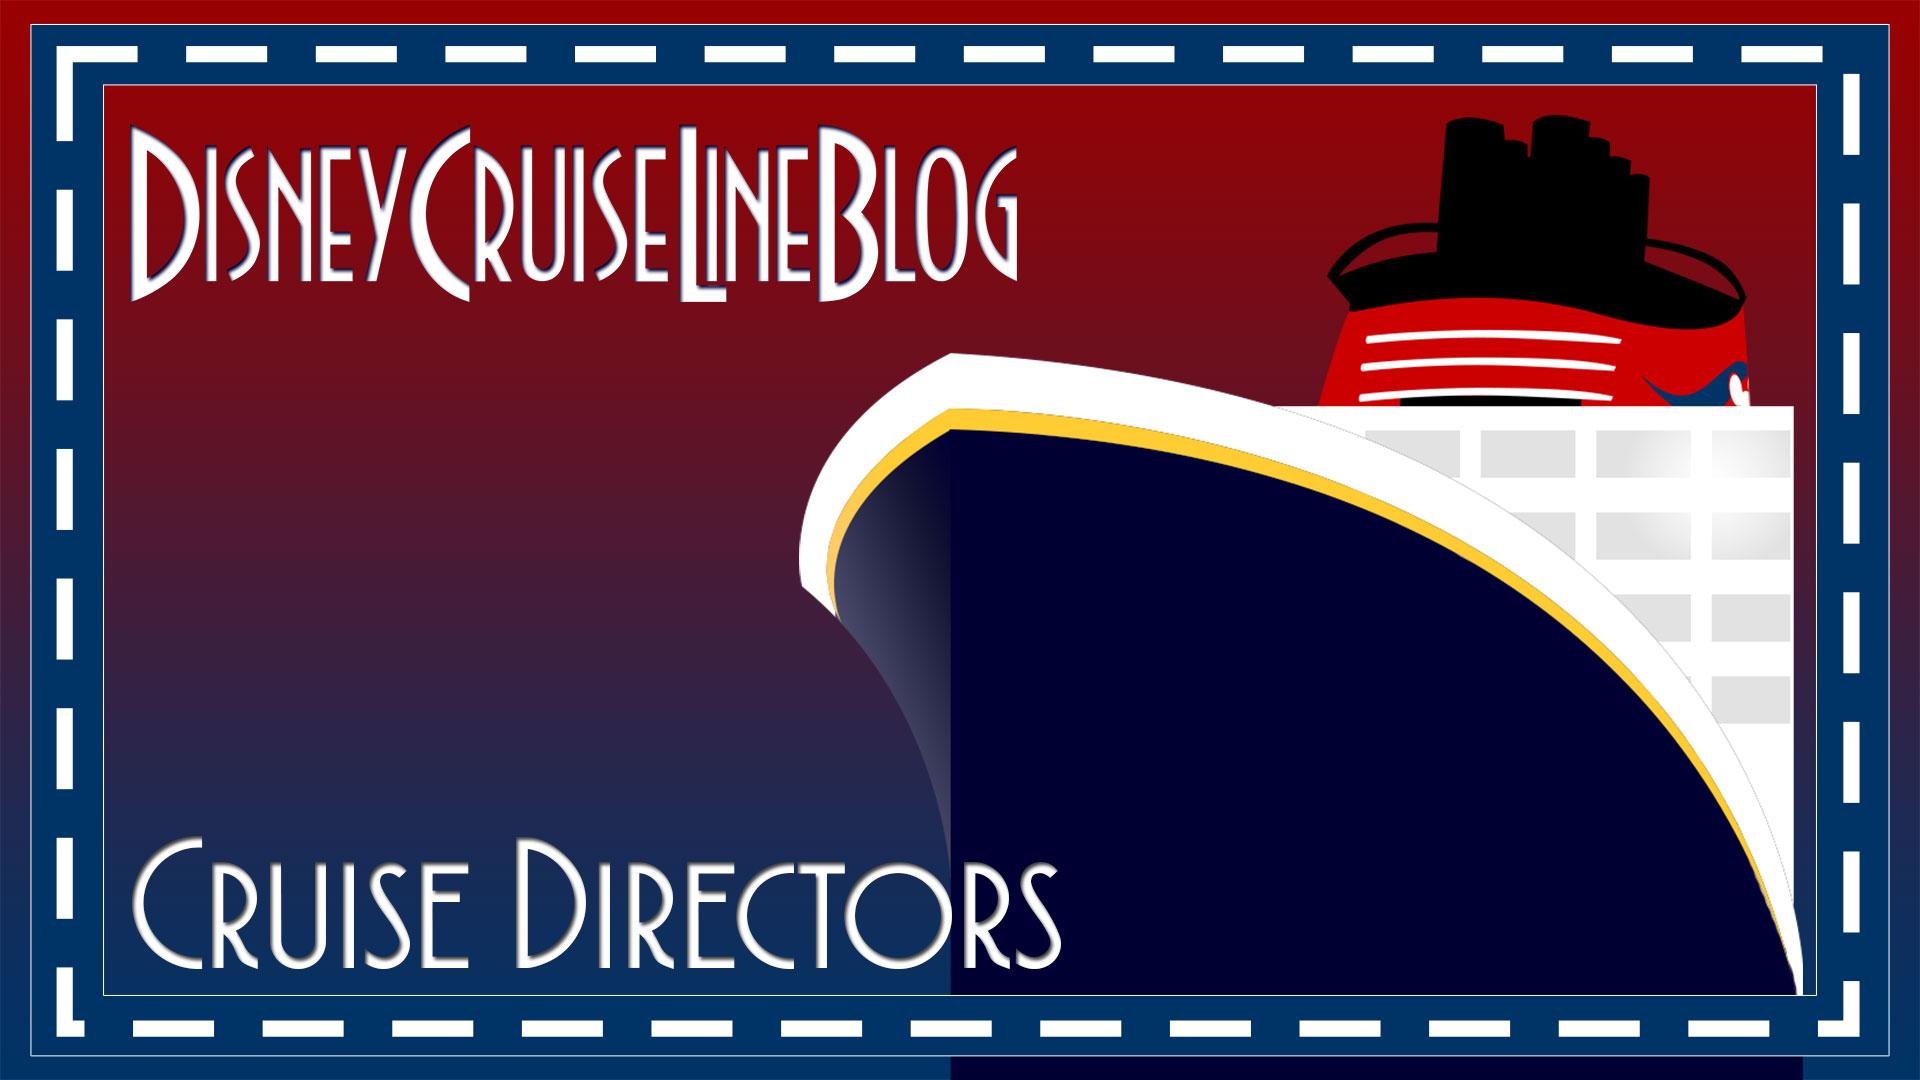 DCLBlog Cruise Directors